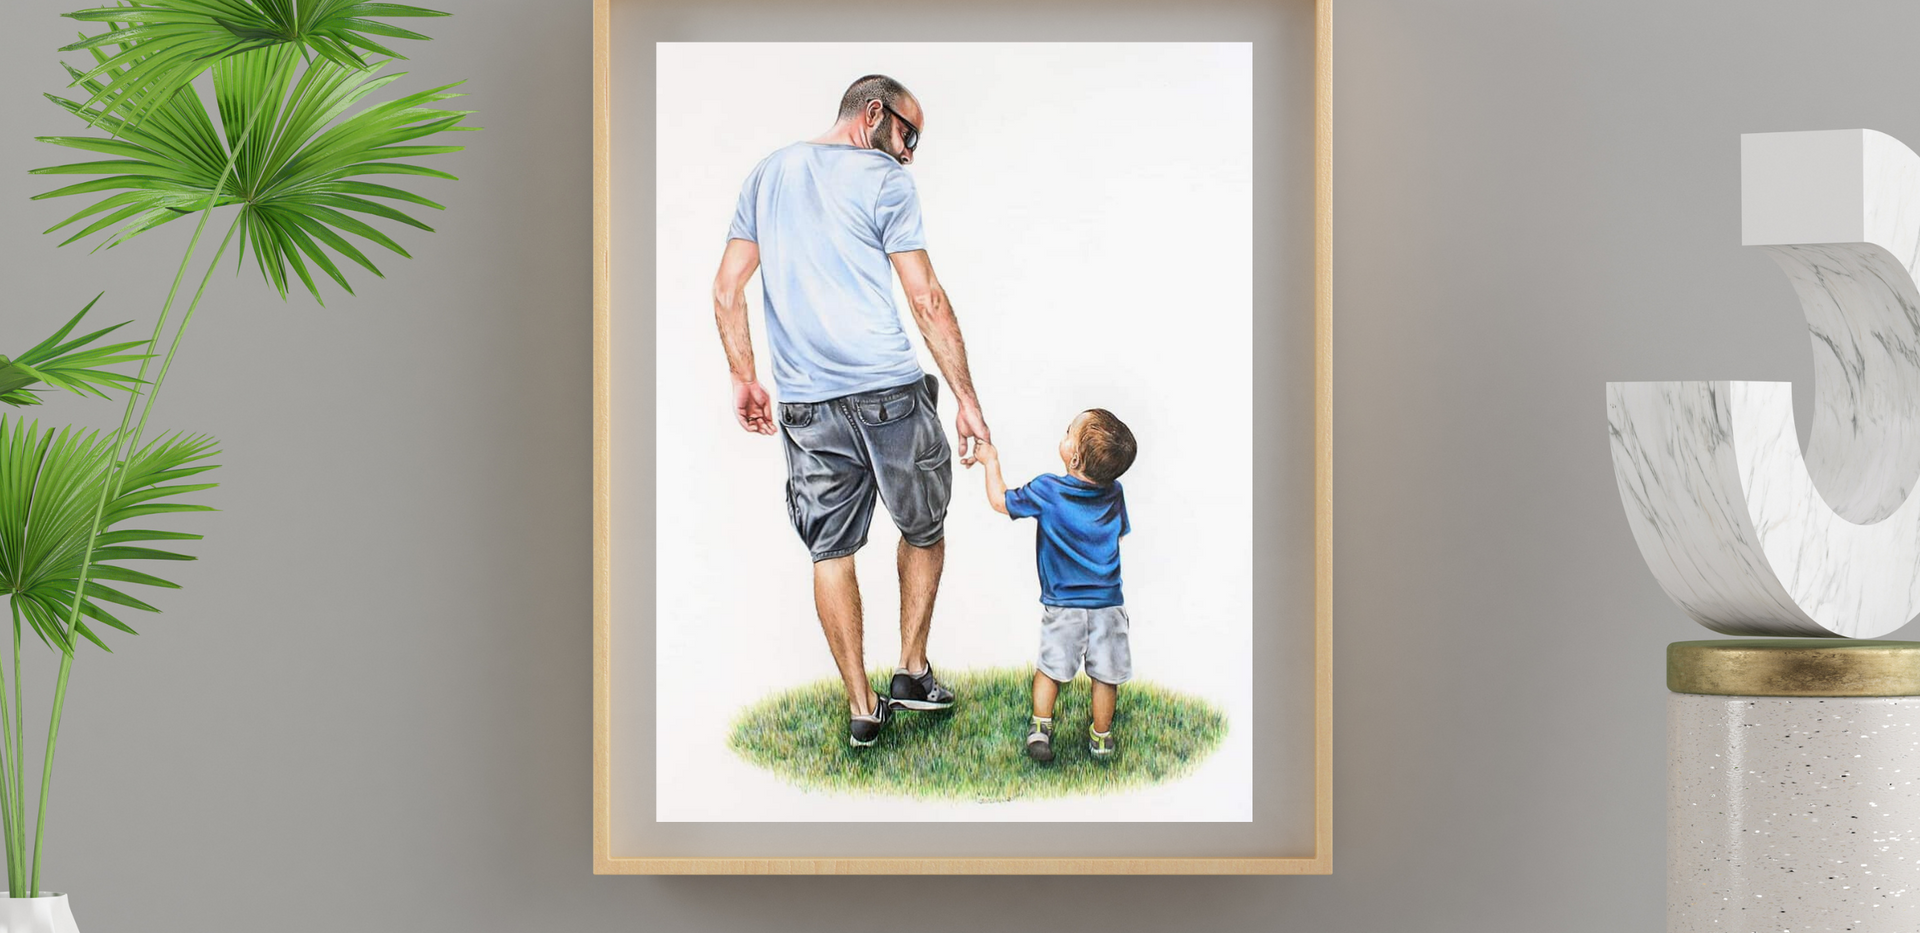 Family Portrait - Father & Son